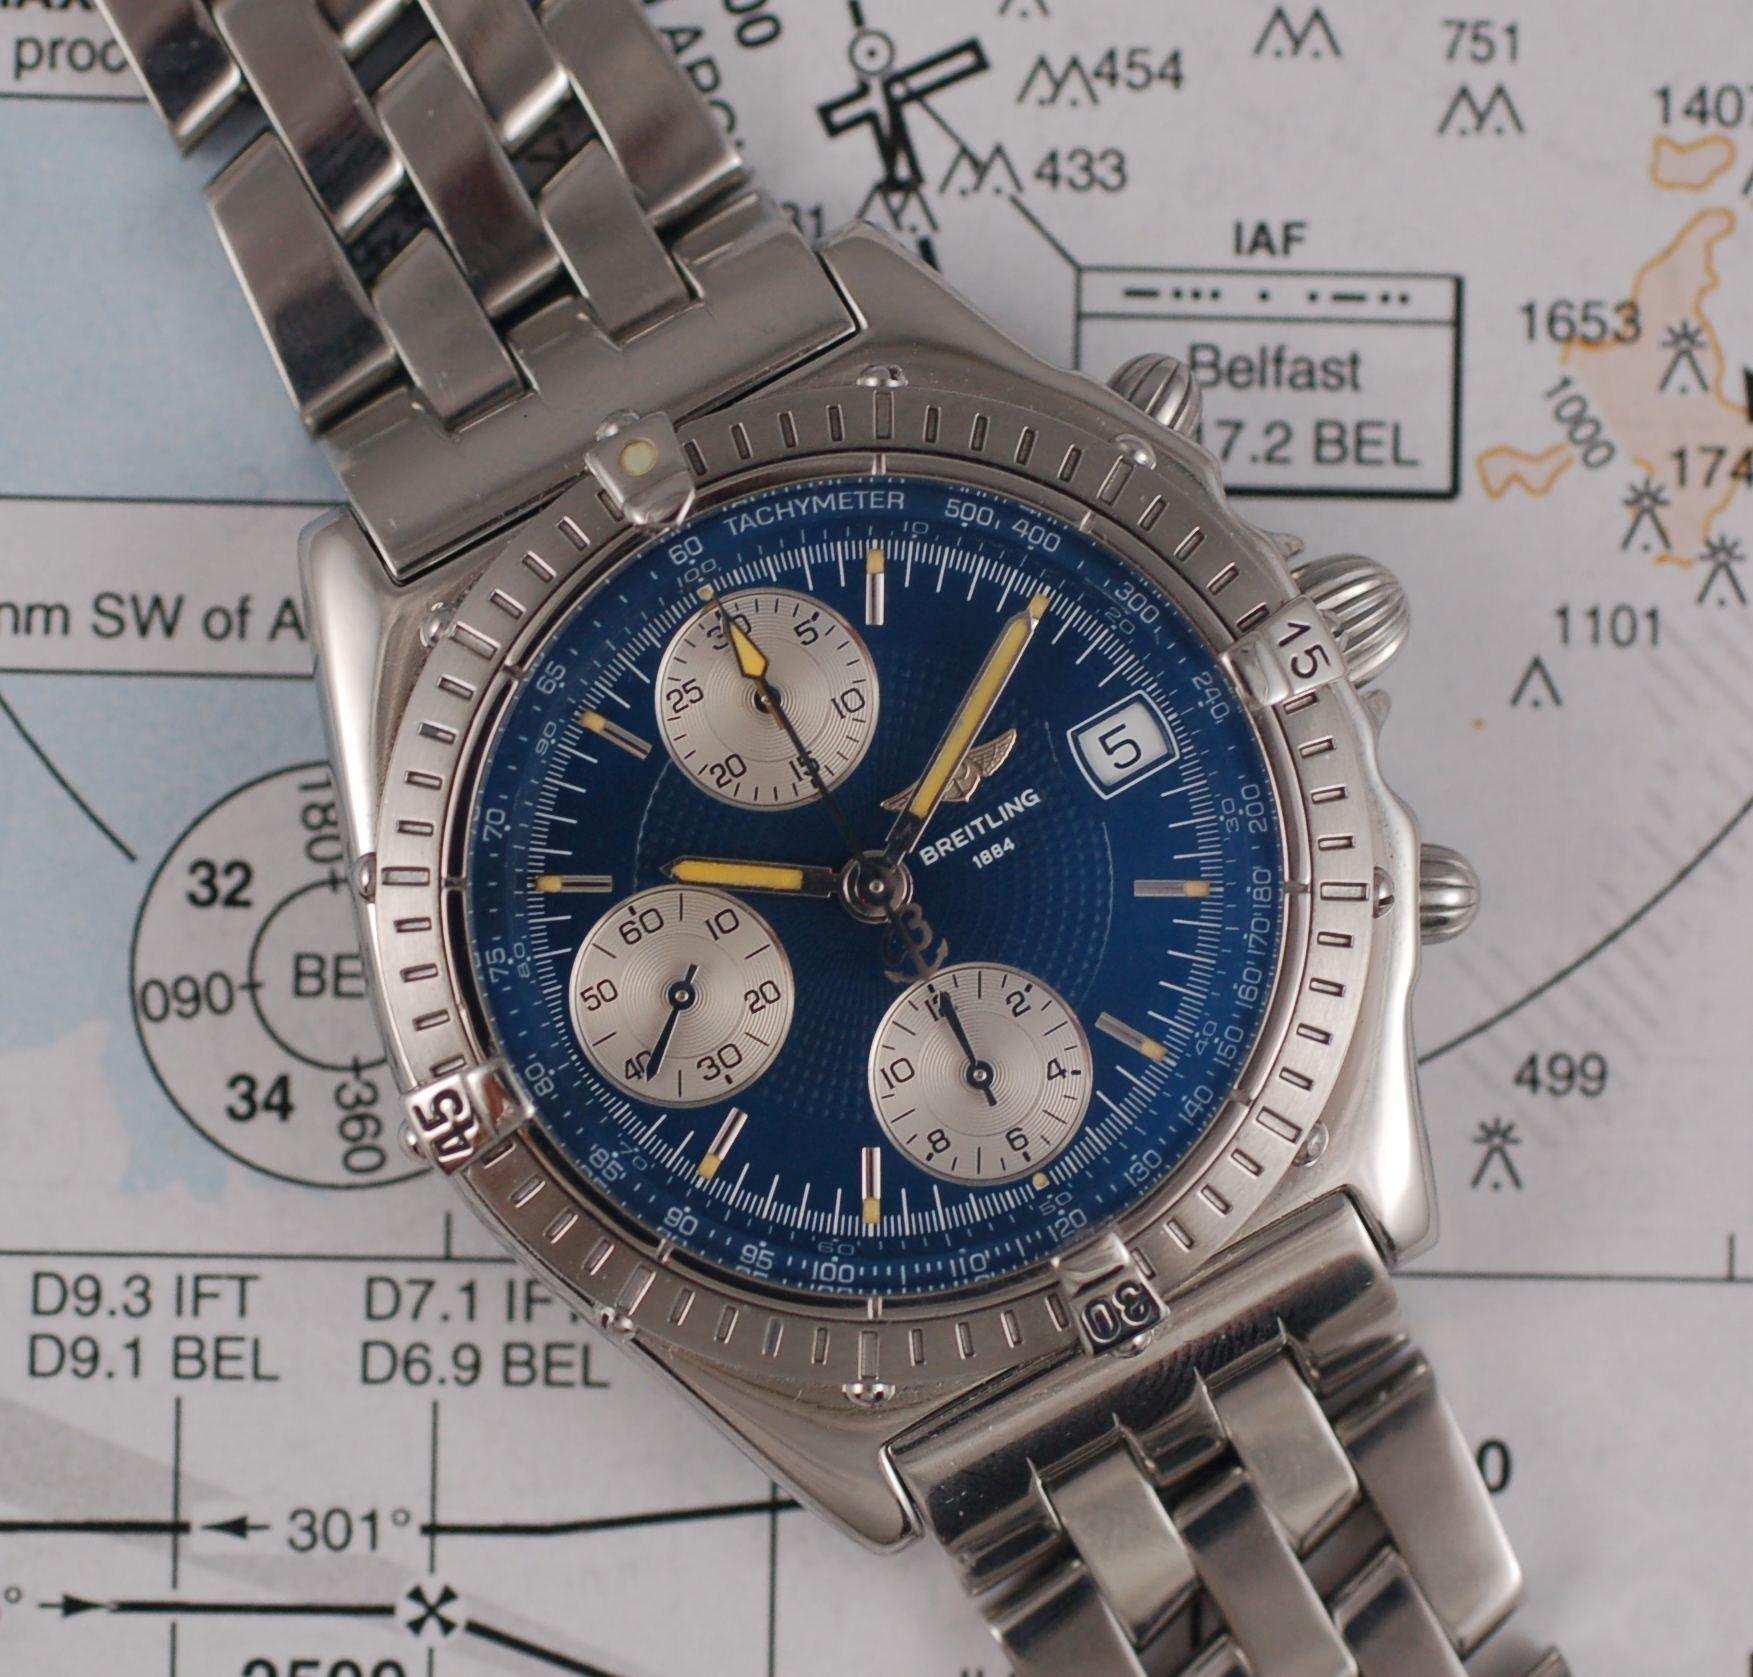 Every watch brand has got it s Flag model Rolex Submariner Cartier